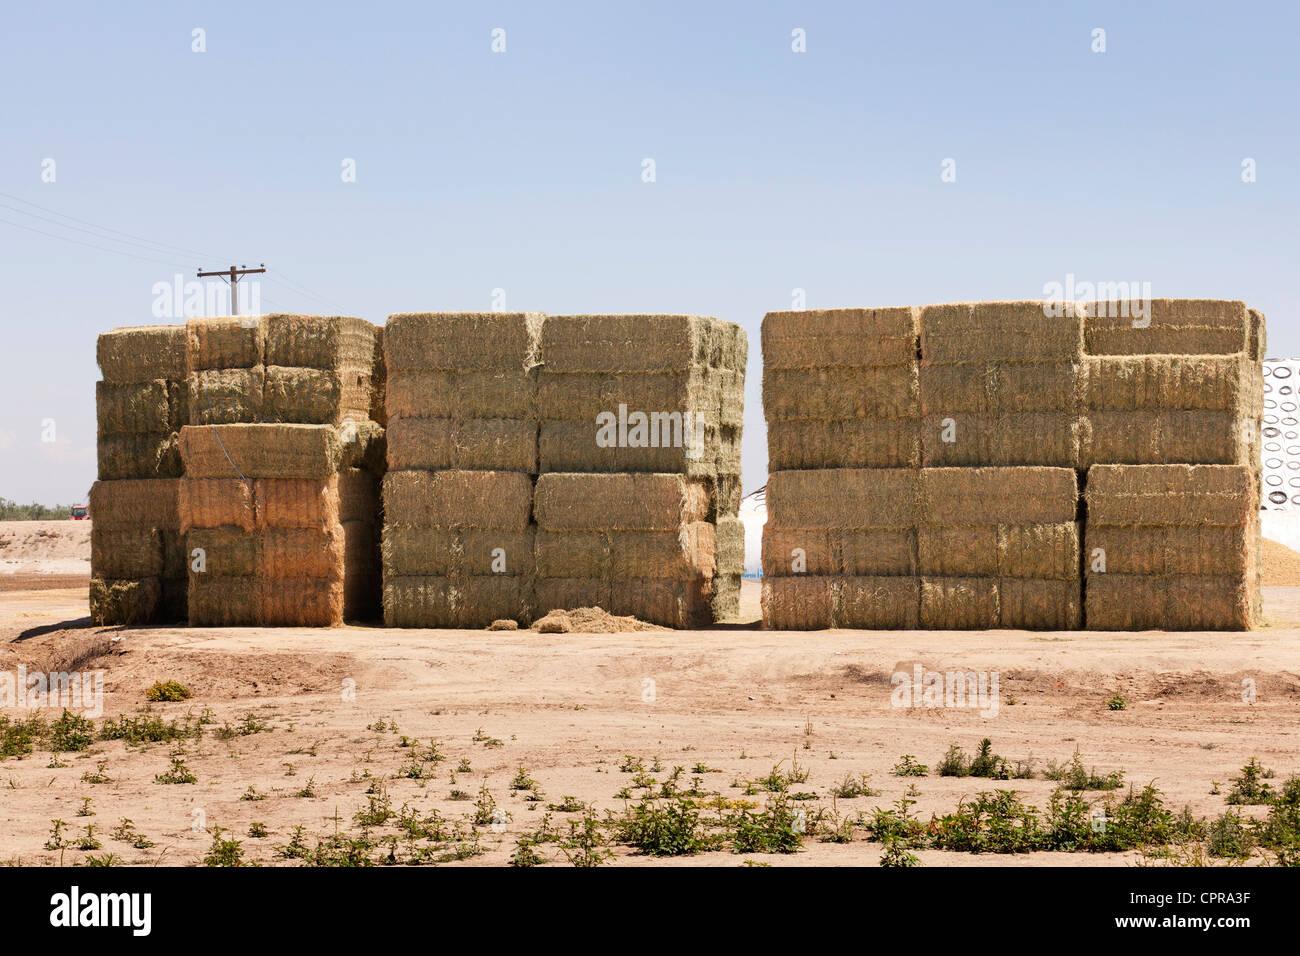 Stacked hay bales - California USA - Stock Image